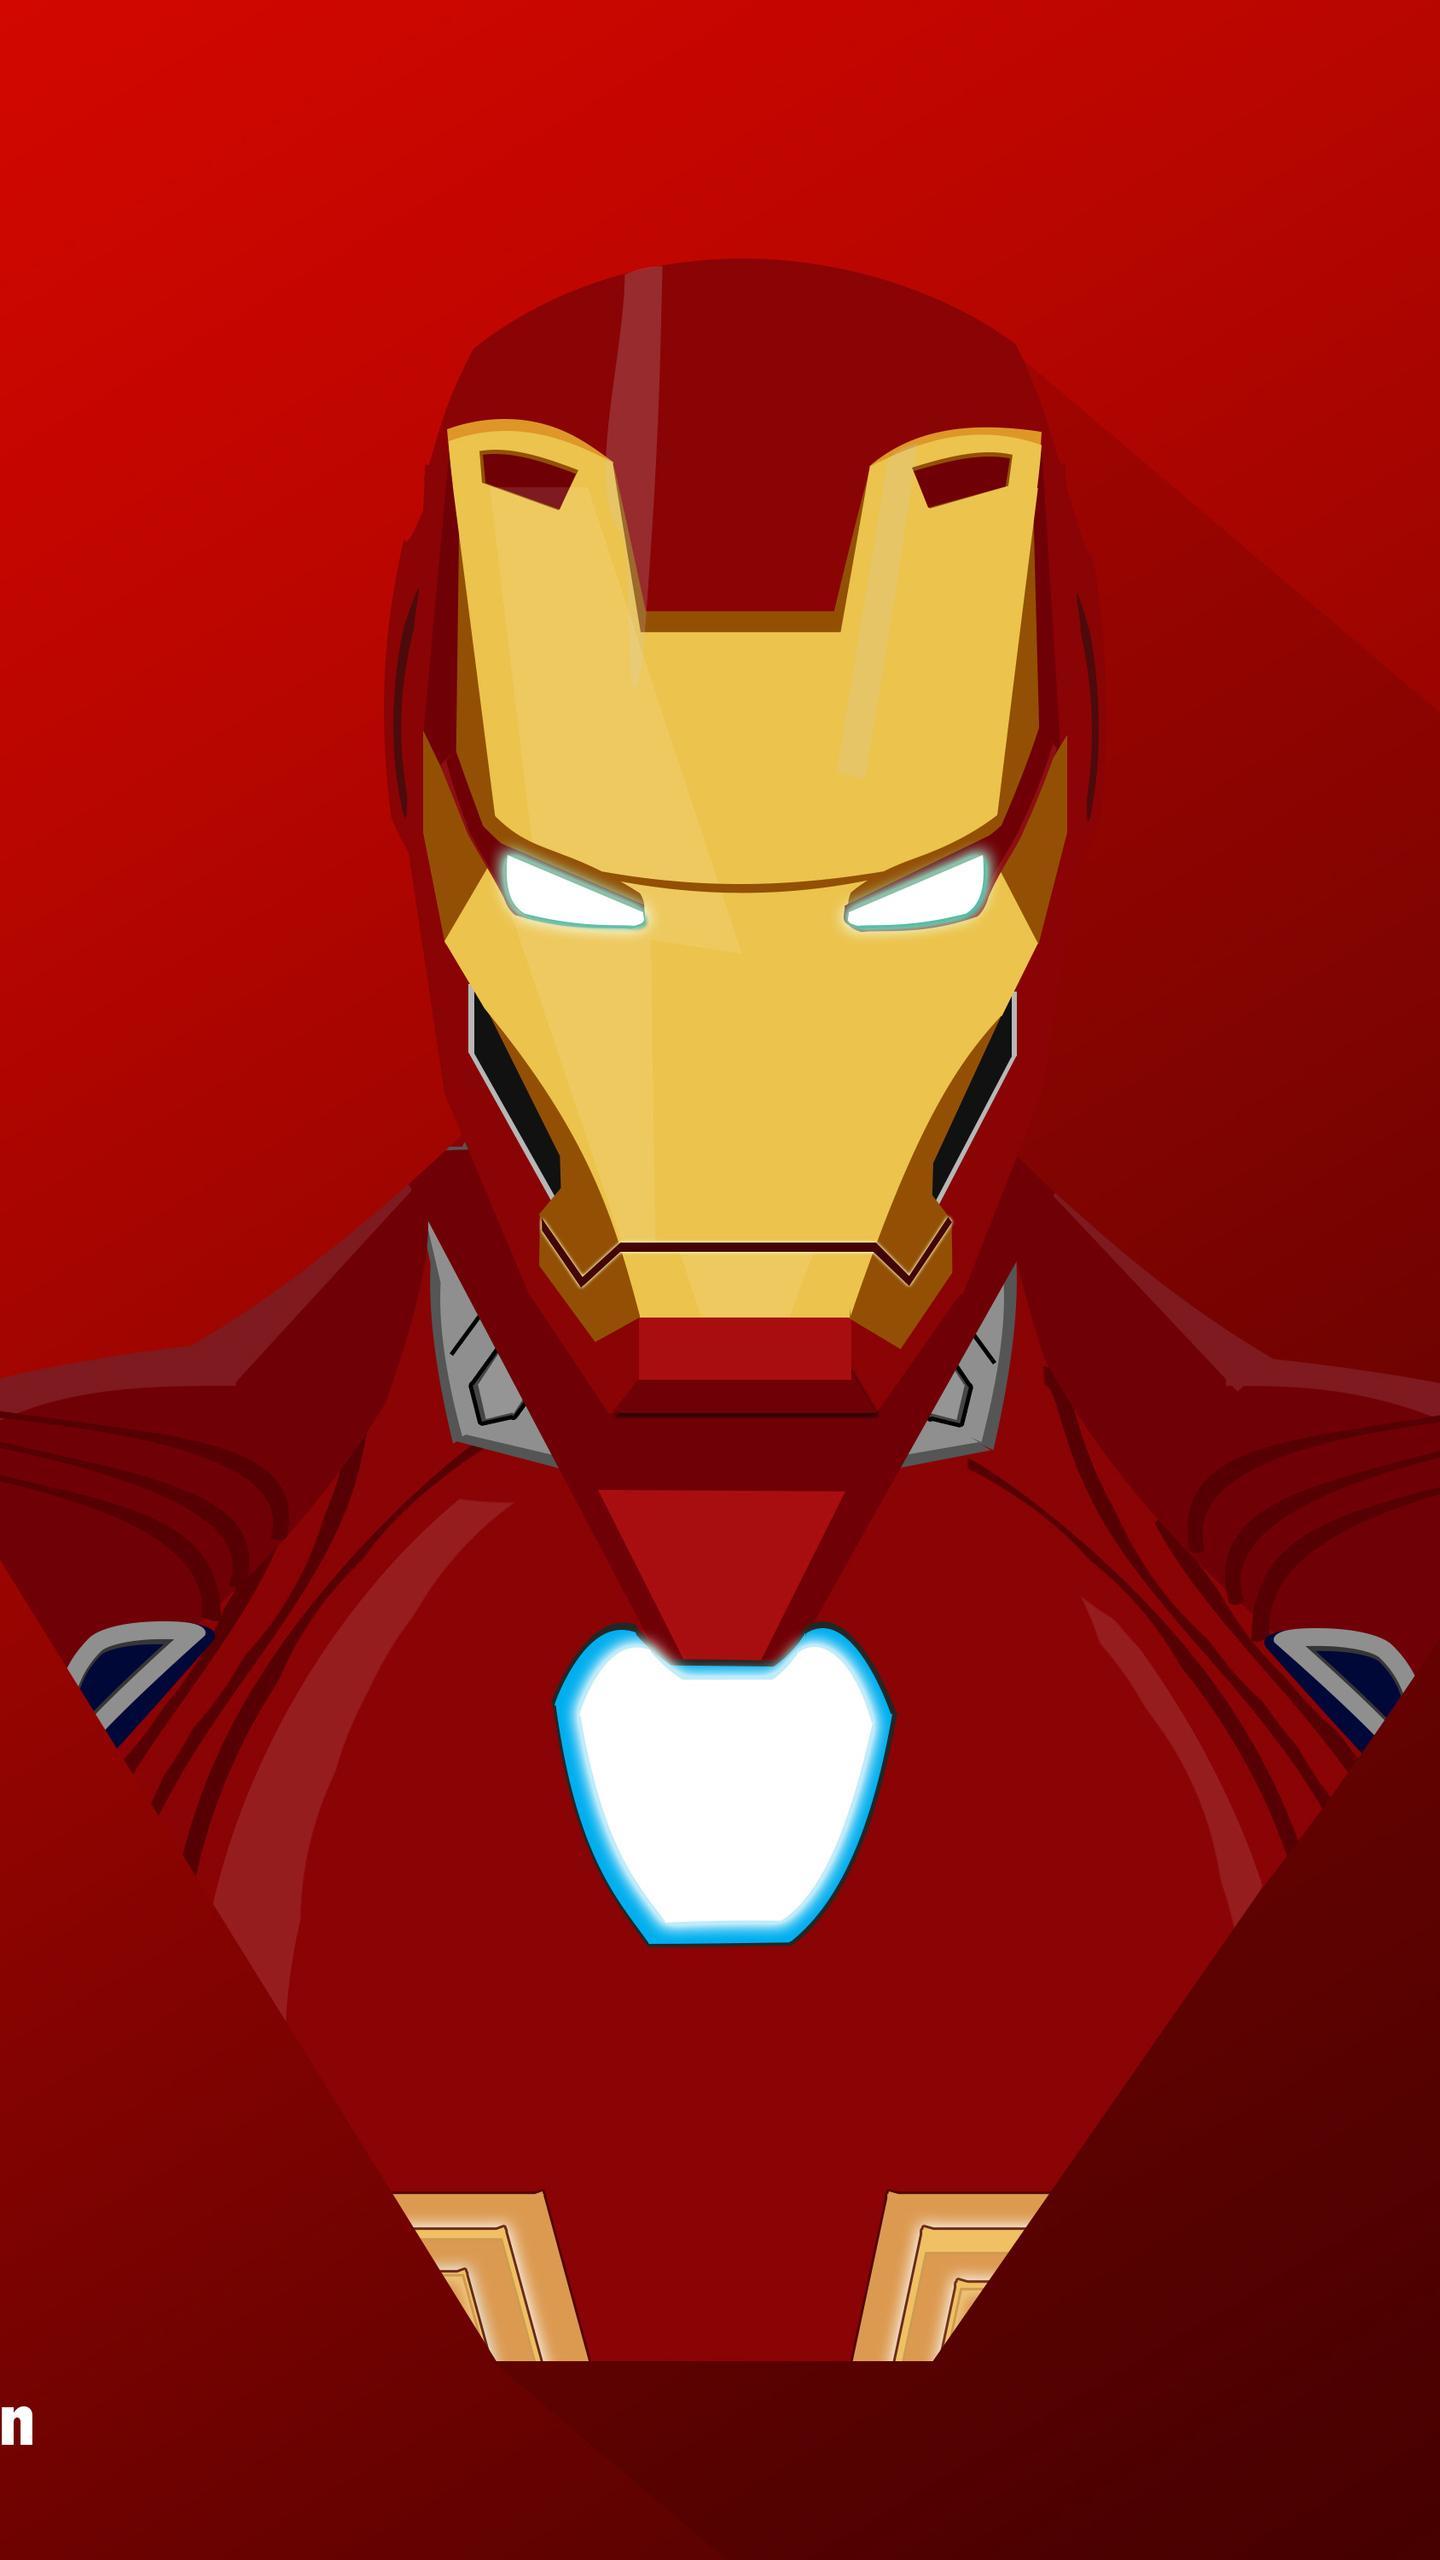 Iron Man Phone Wallpapers - Wallpaper Cave